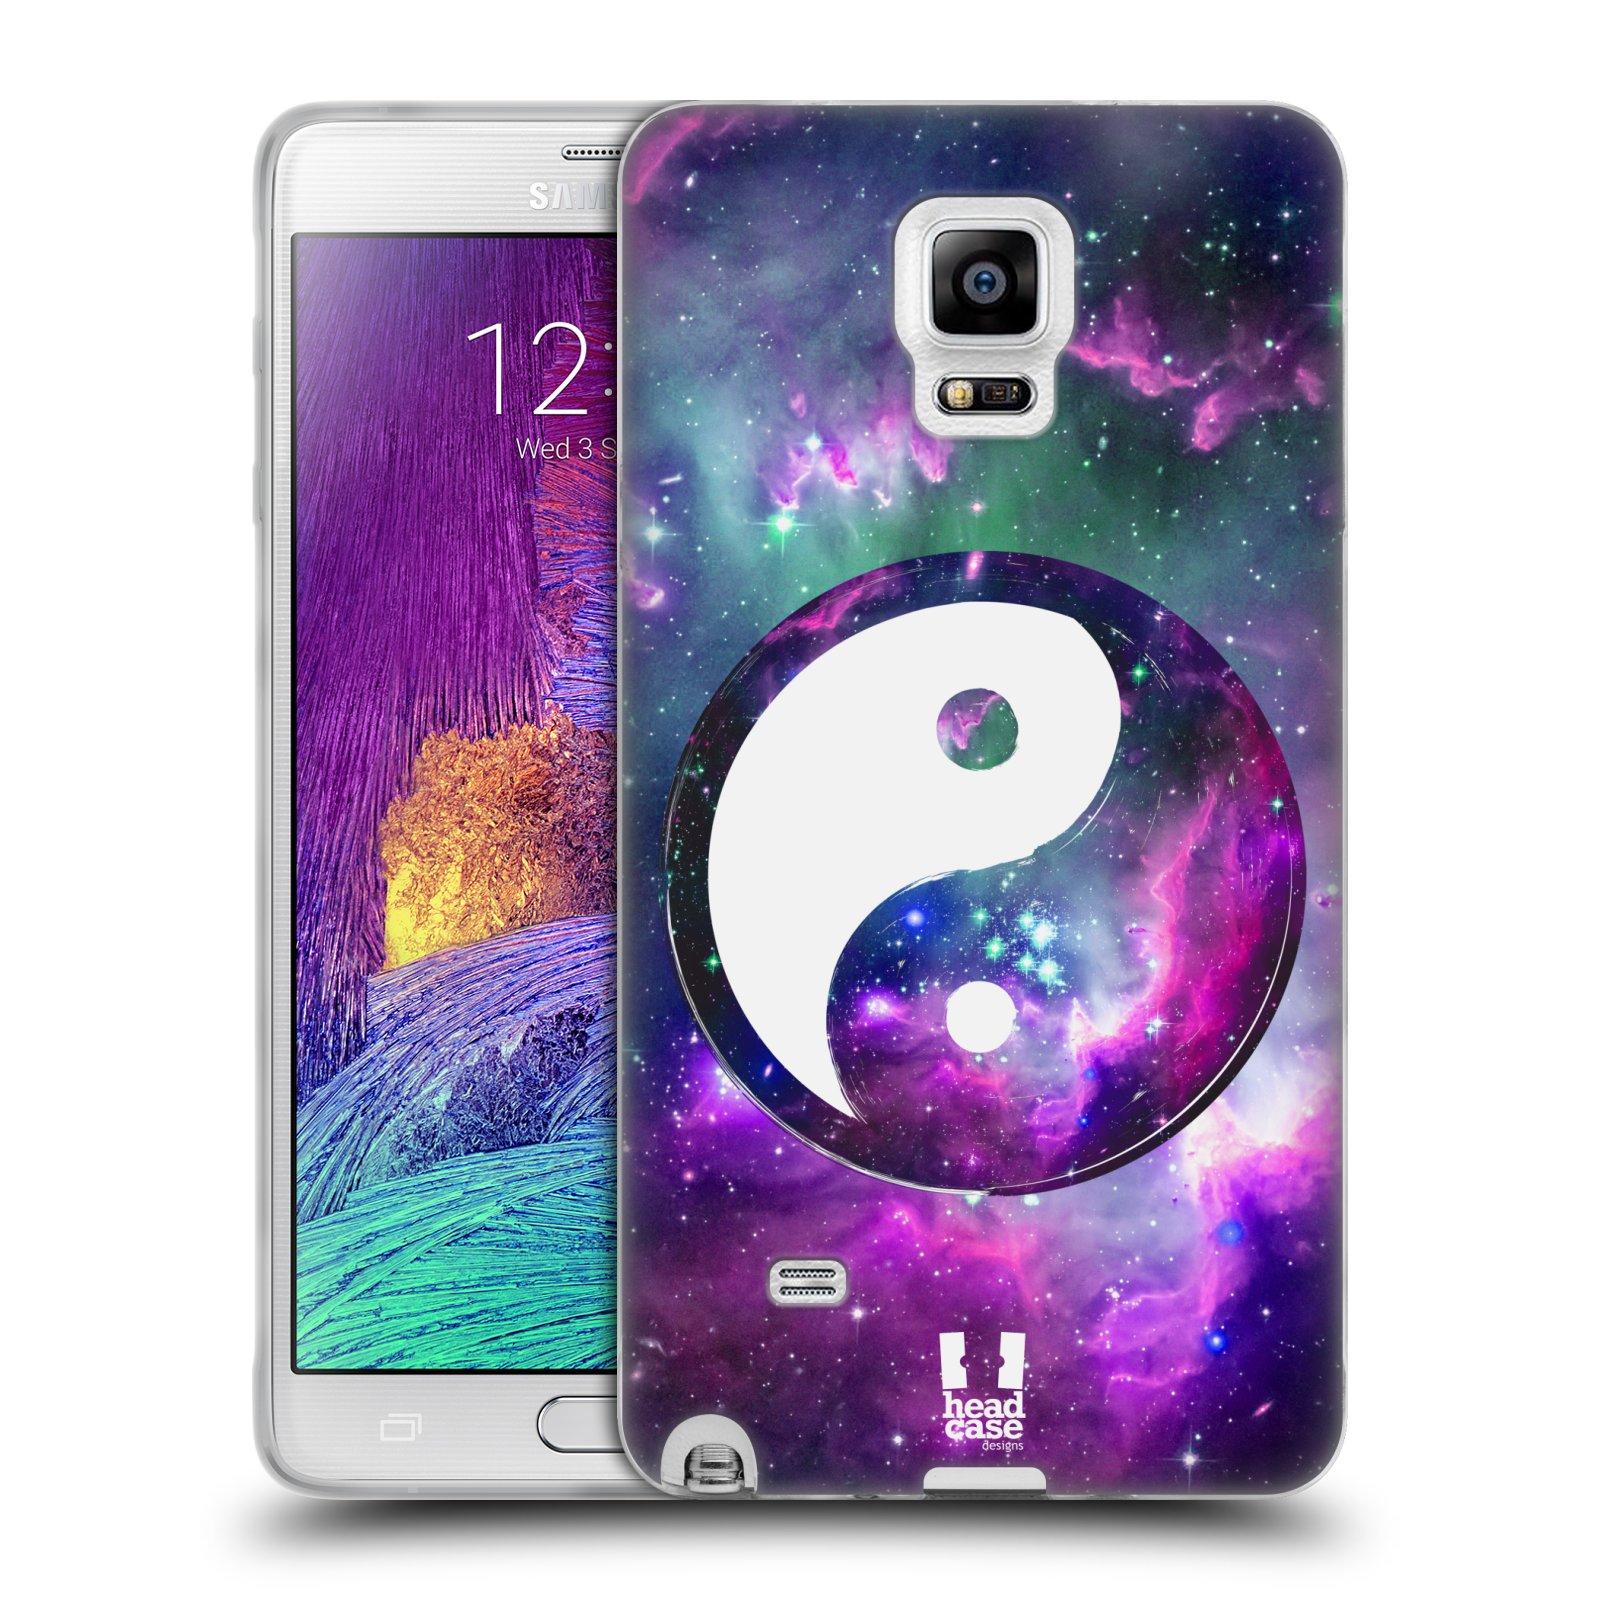 Silikonové pouzdro na mobil Samsung Galaxy Note 4 HEAD CASE YIn a Yang PURPLE (Silikonový kryt či obal na mobilní telefon Samsung Galaxy Note 4 SM-N910F)